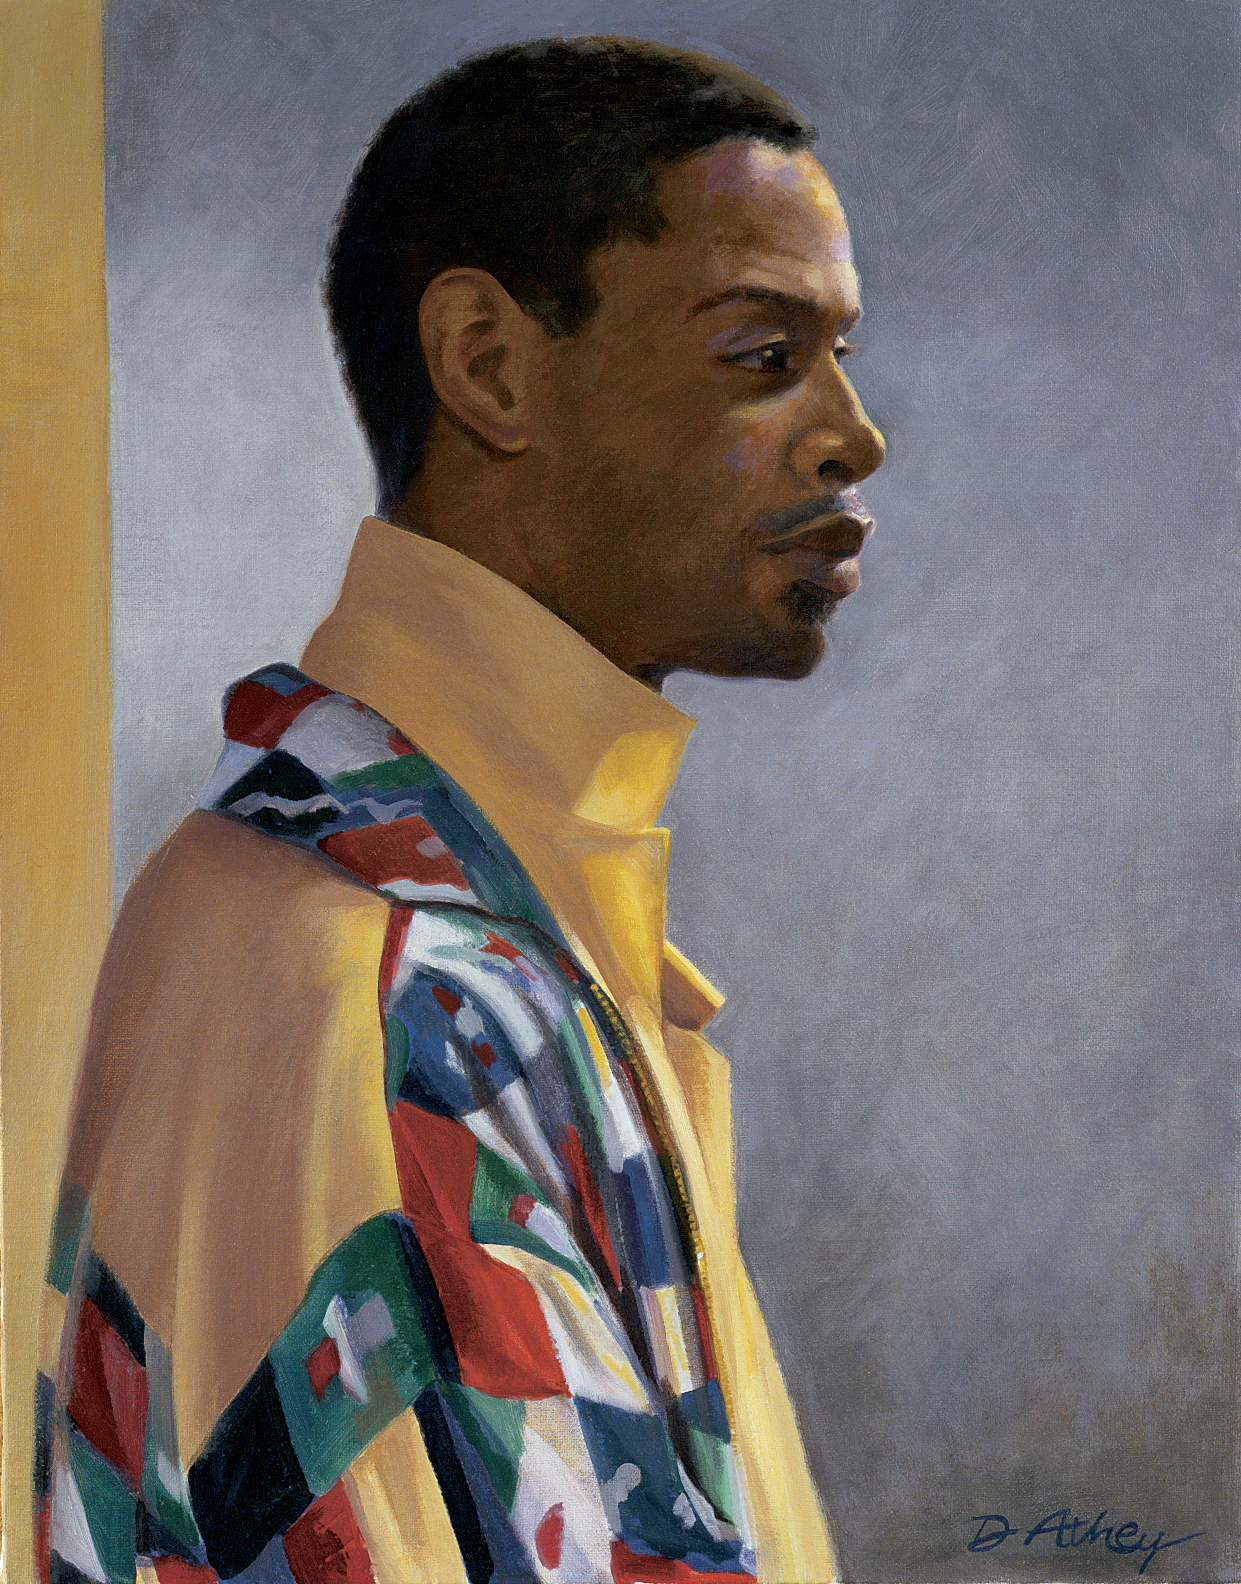 """The Multi-Colored Coat"" 2002, 20x16"", Oil on Linen"